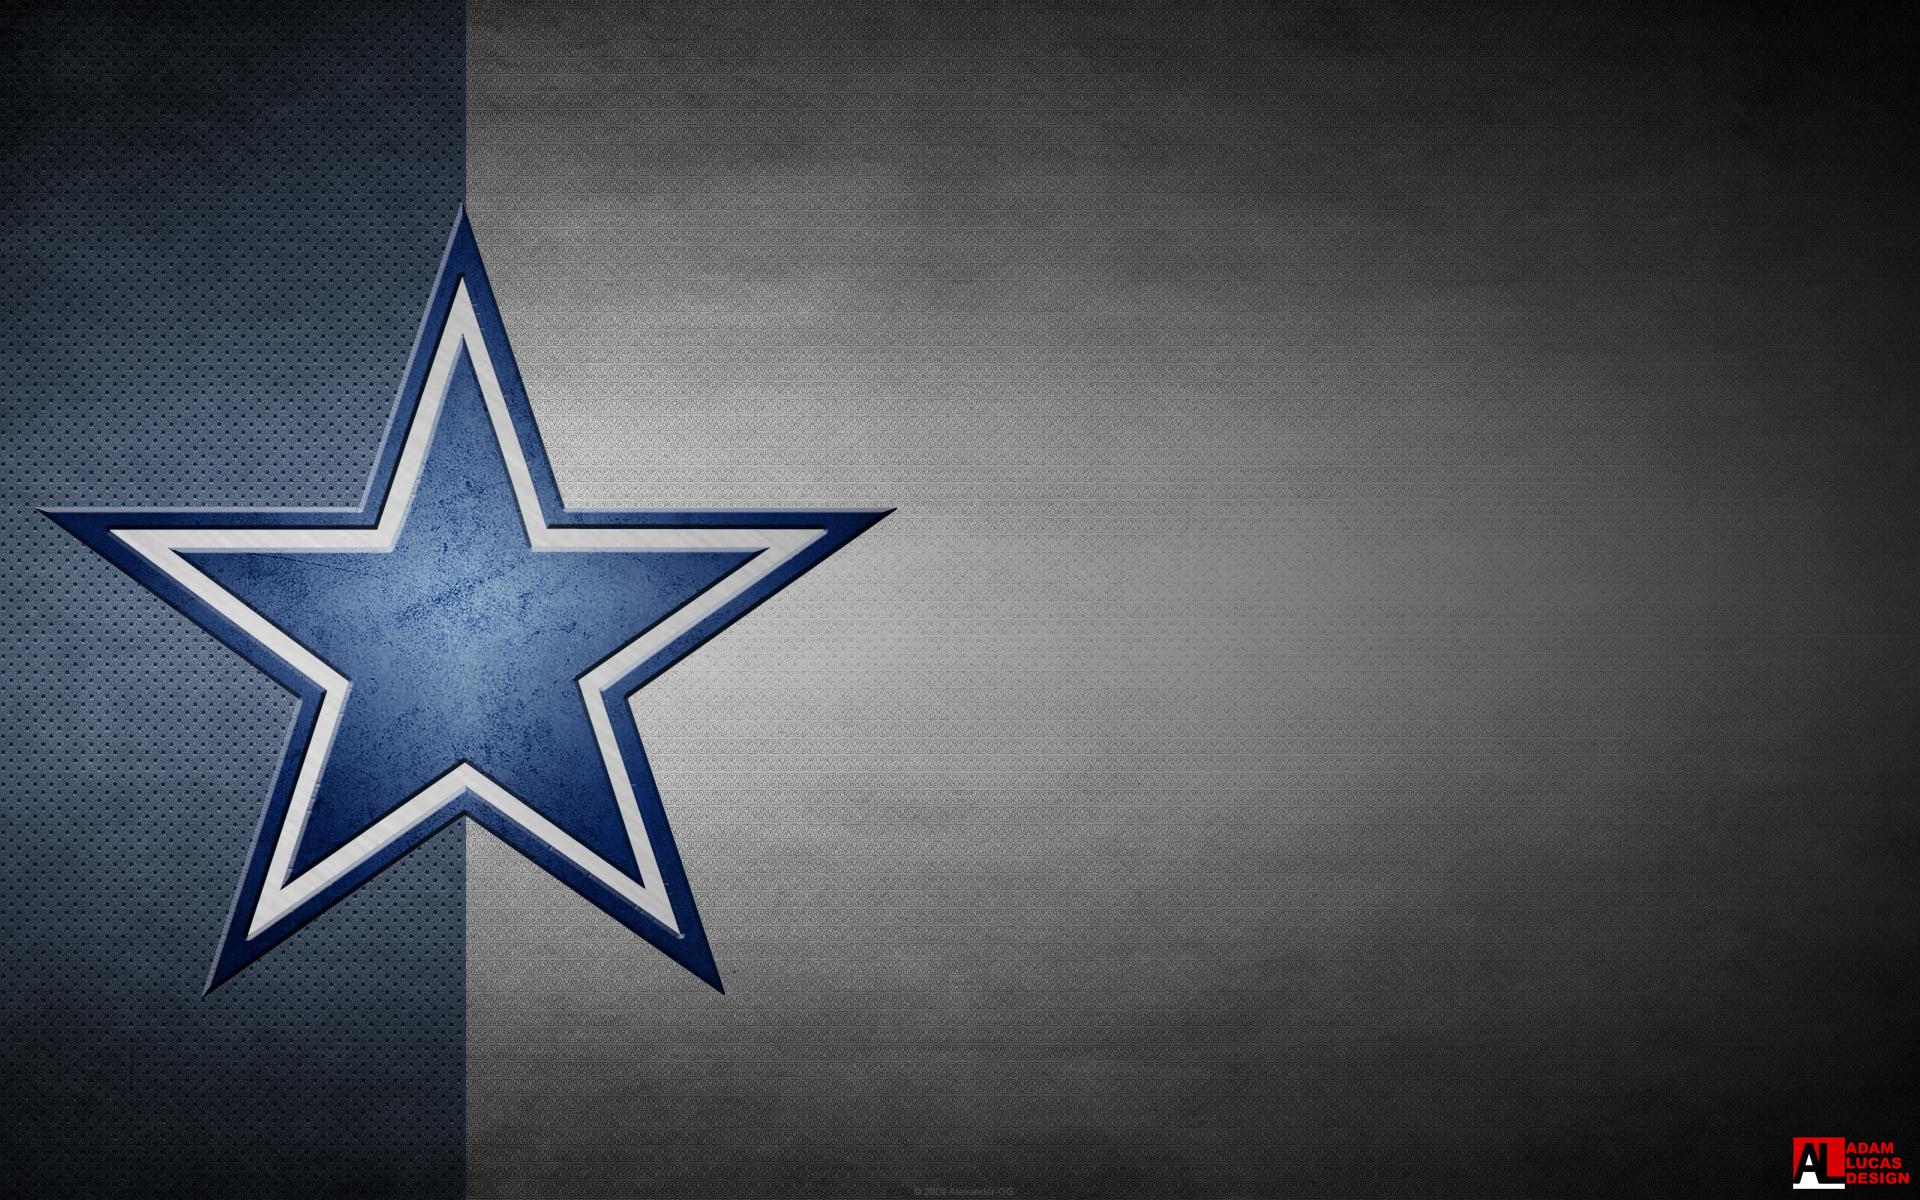 49+ Dallas Cowboys Free Desktop Wallpaper on WallpaperSafari